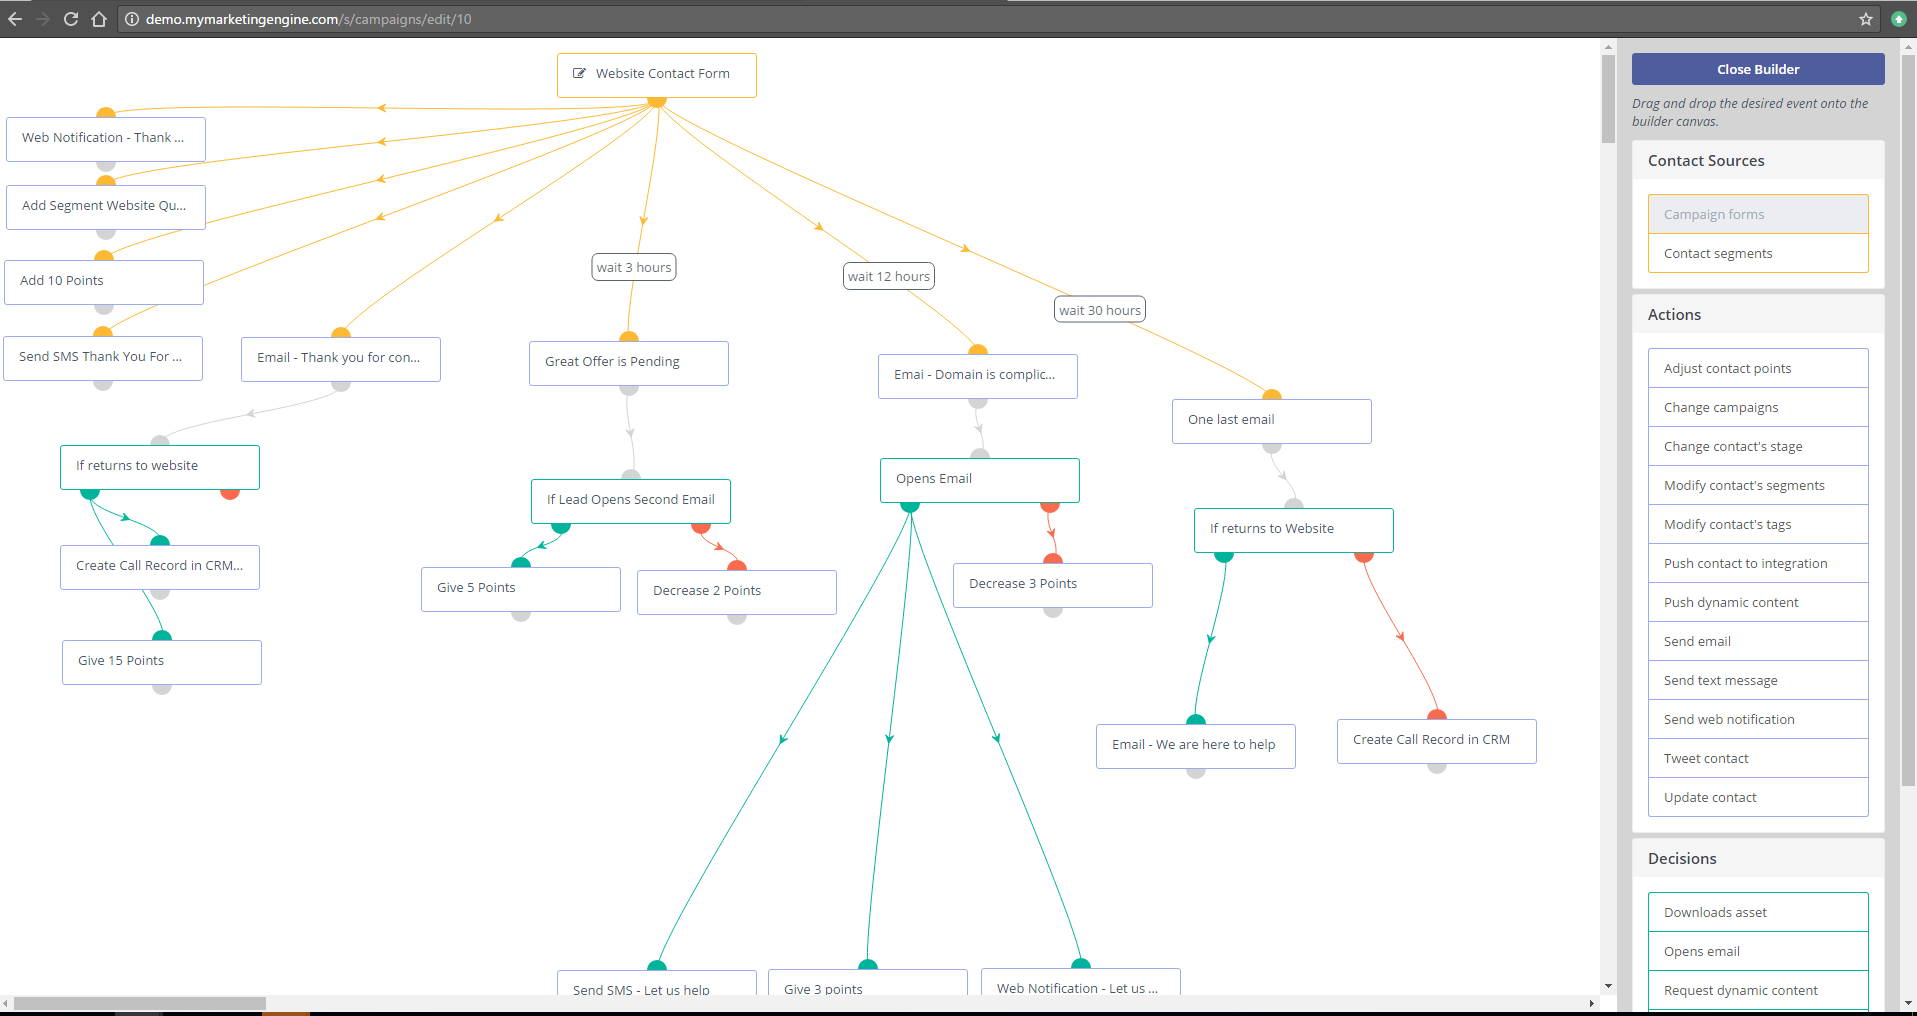 Marketing CampaignWorkflow Example My Marketing Engine – Sample Marketing Campaign